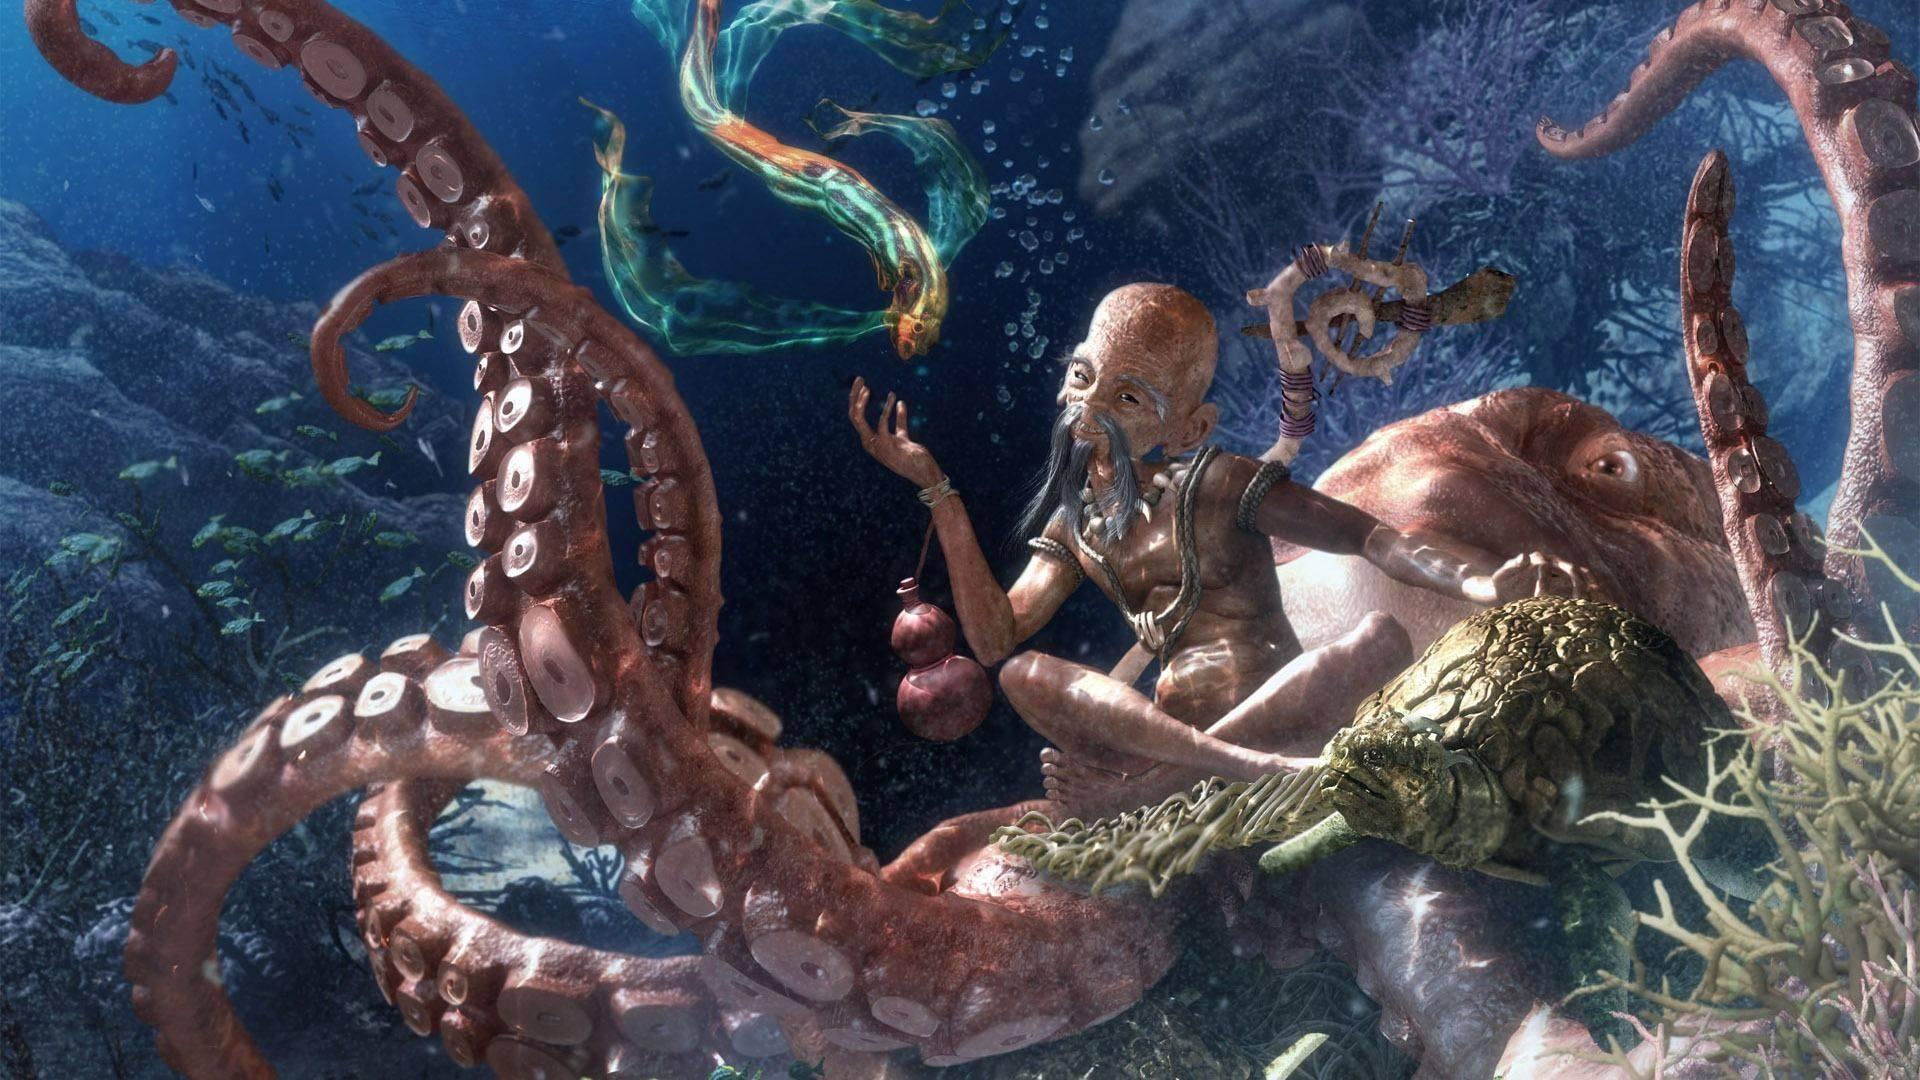 Морской кракен. кракен — легендарное чудовище из морских глубин